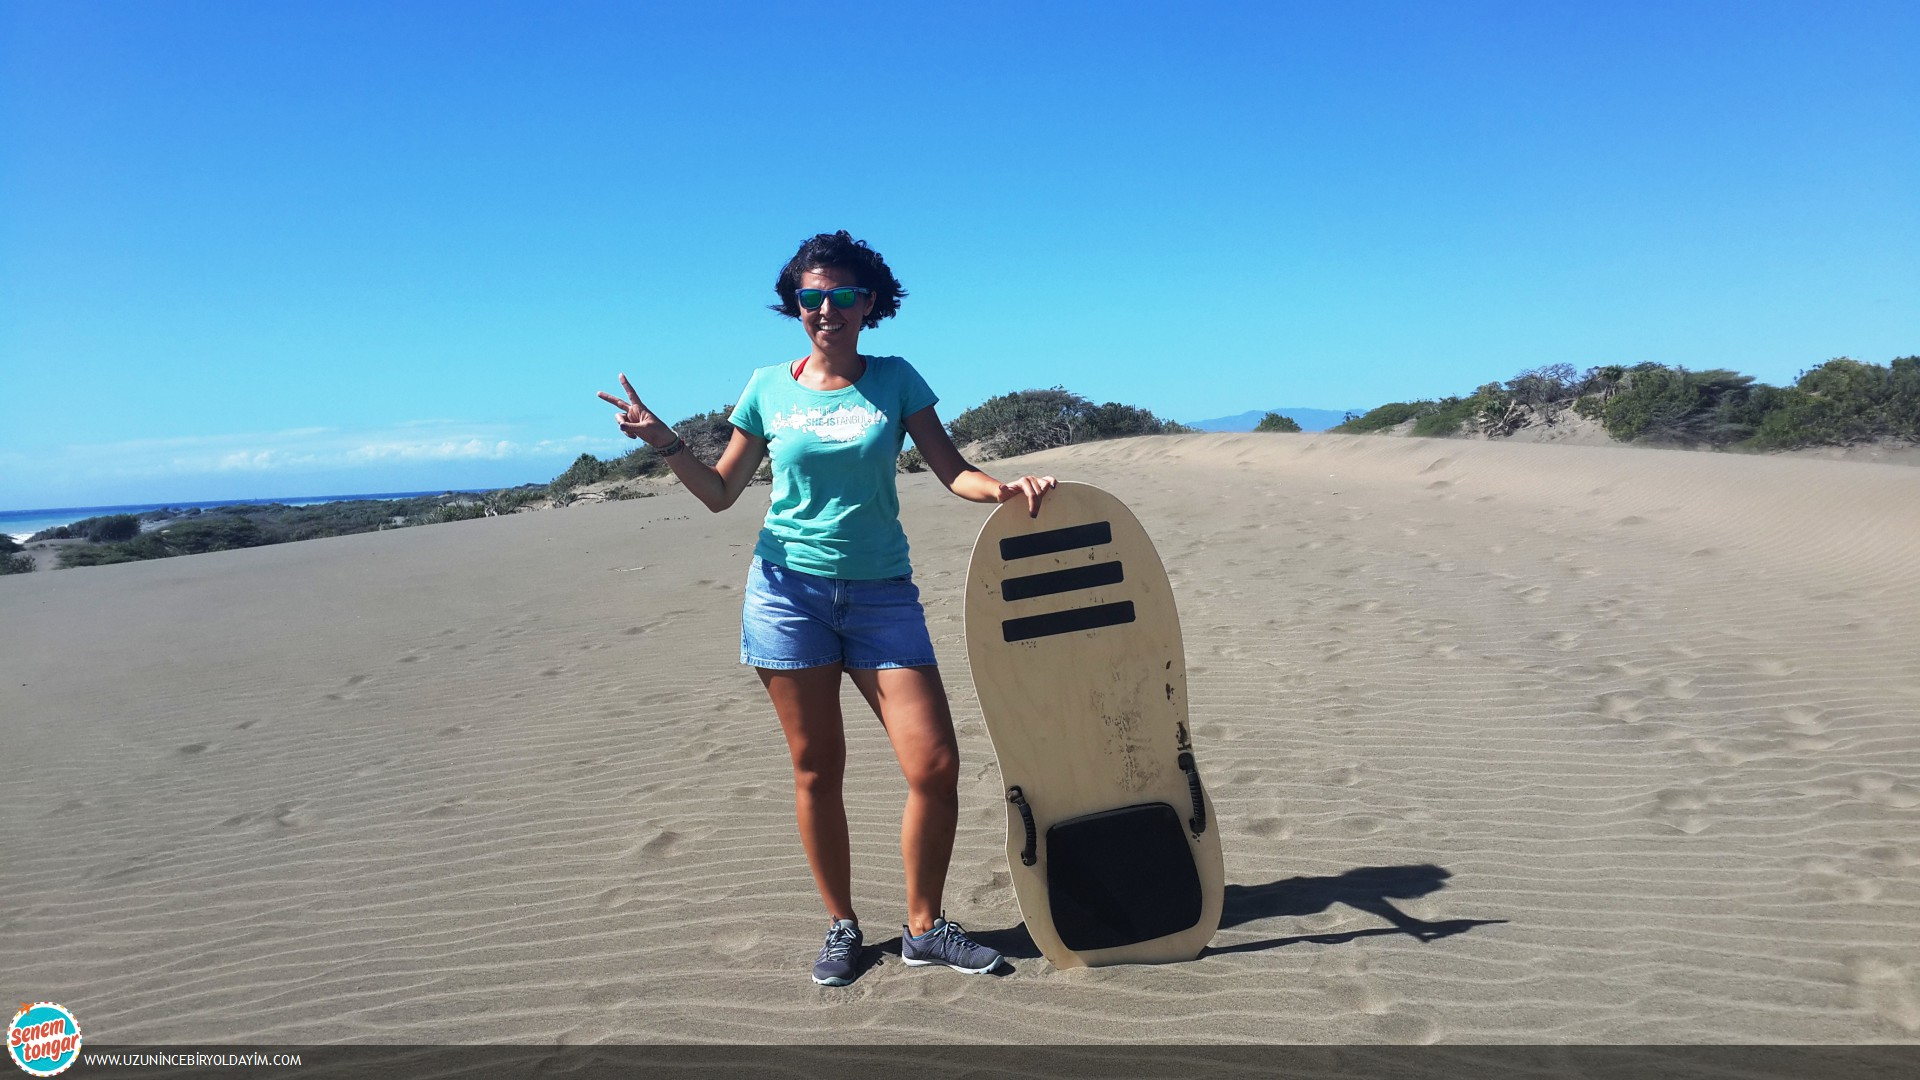 Dominican Rep_SandBoarding